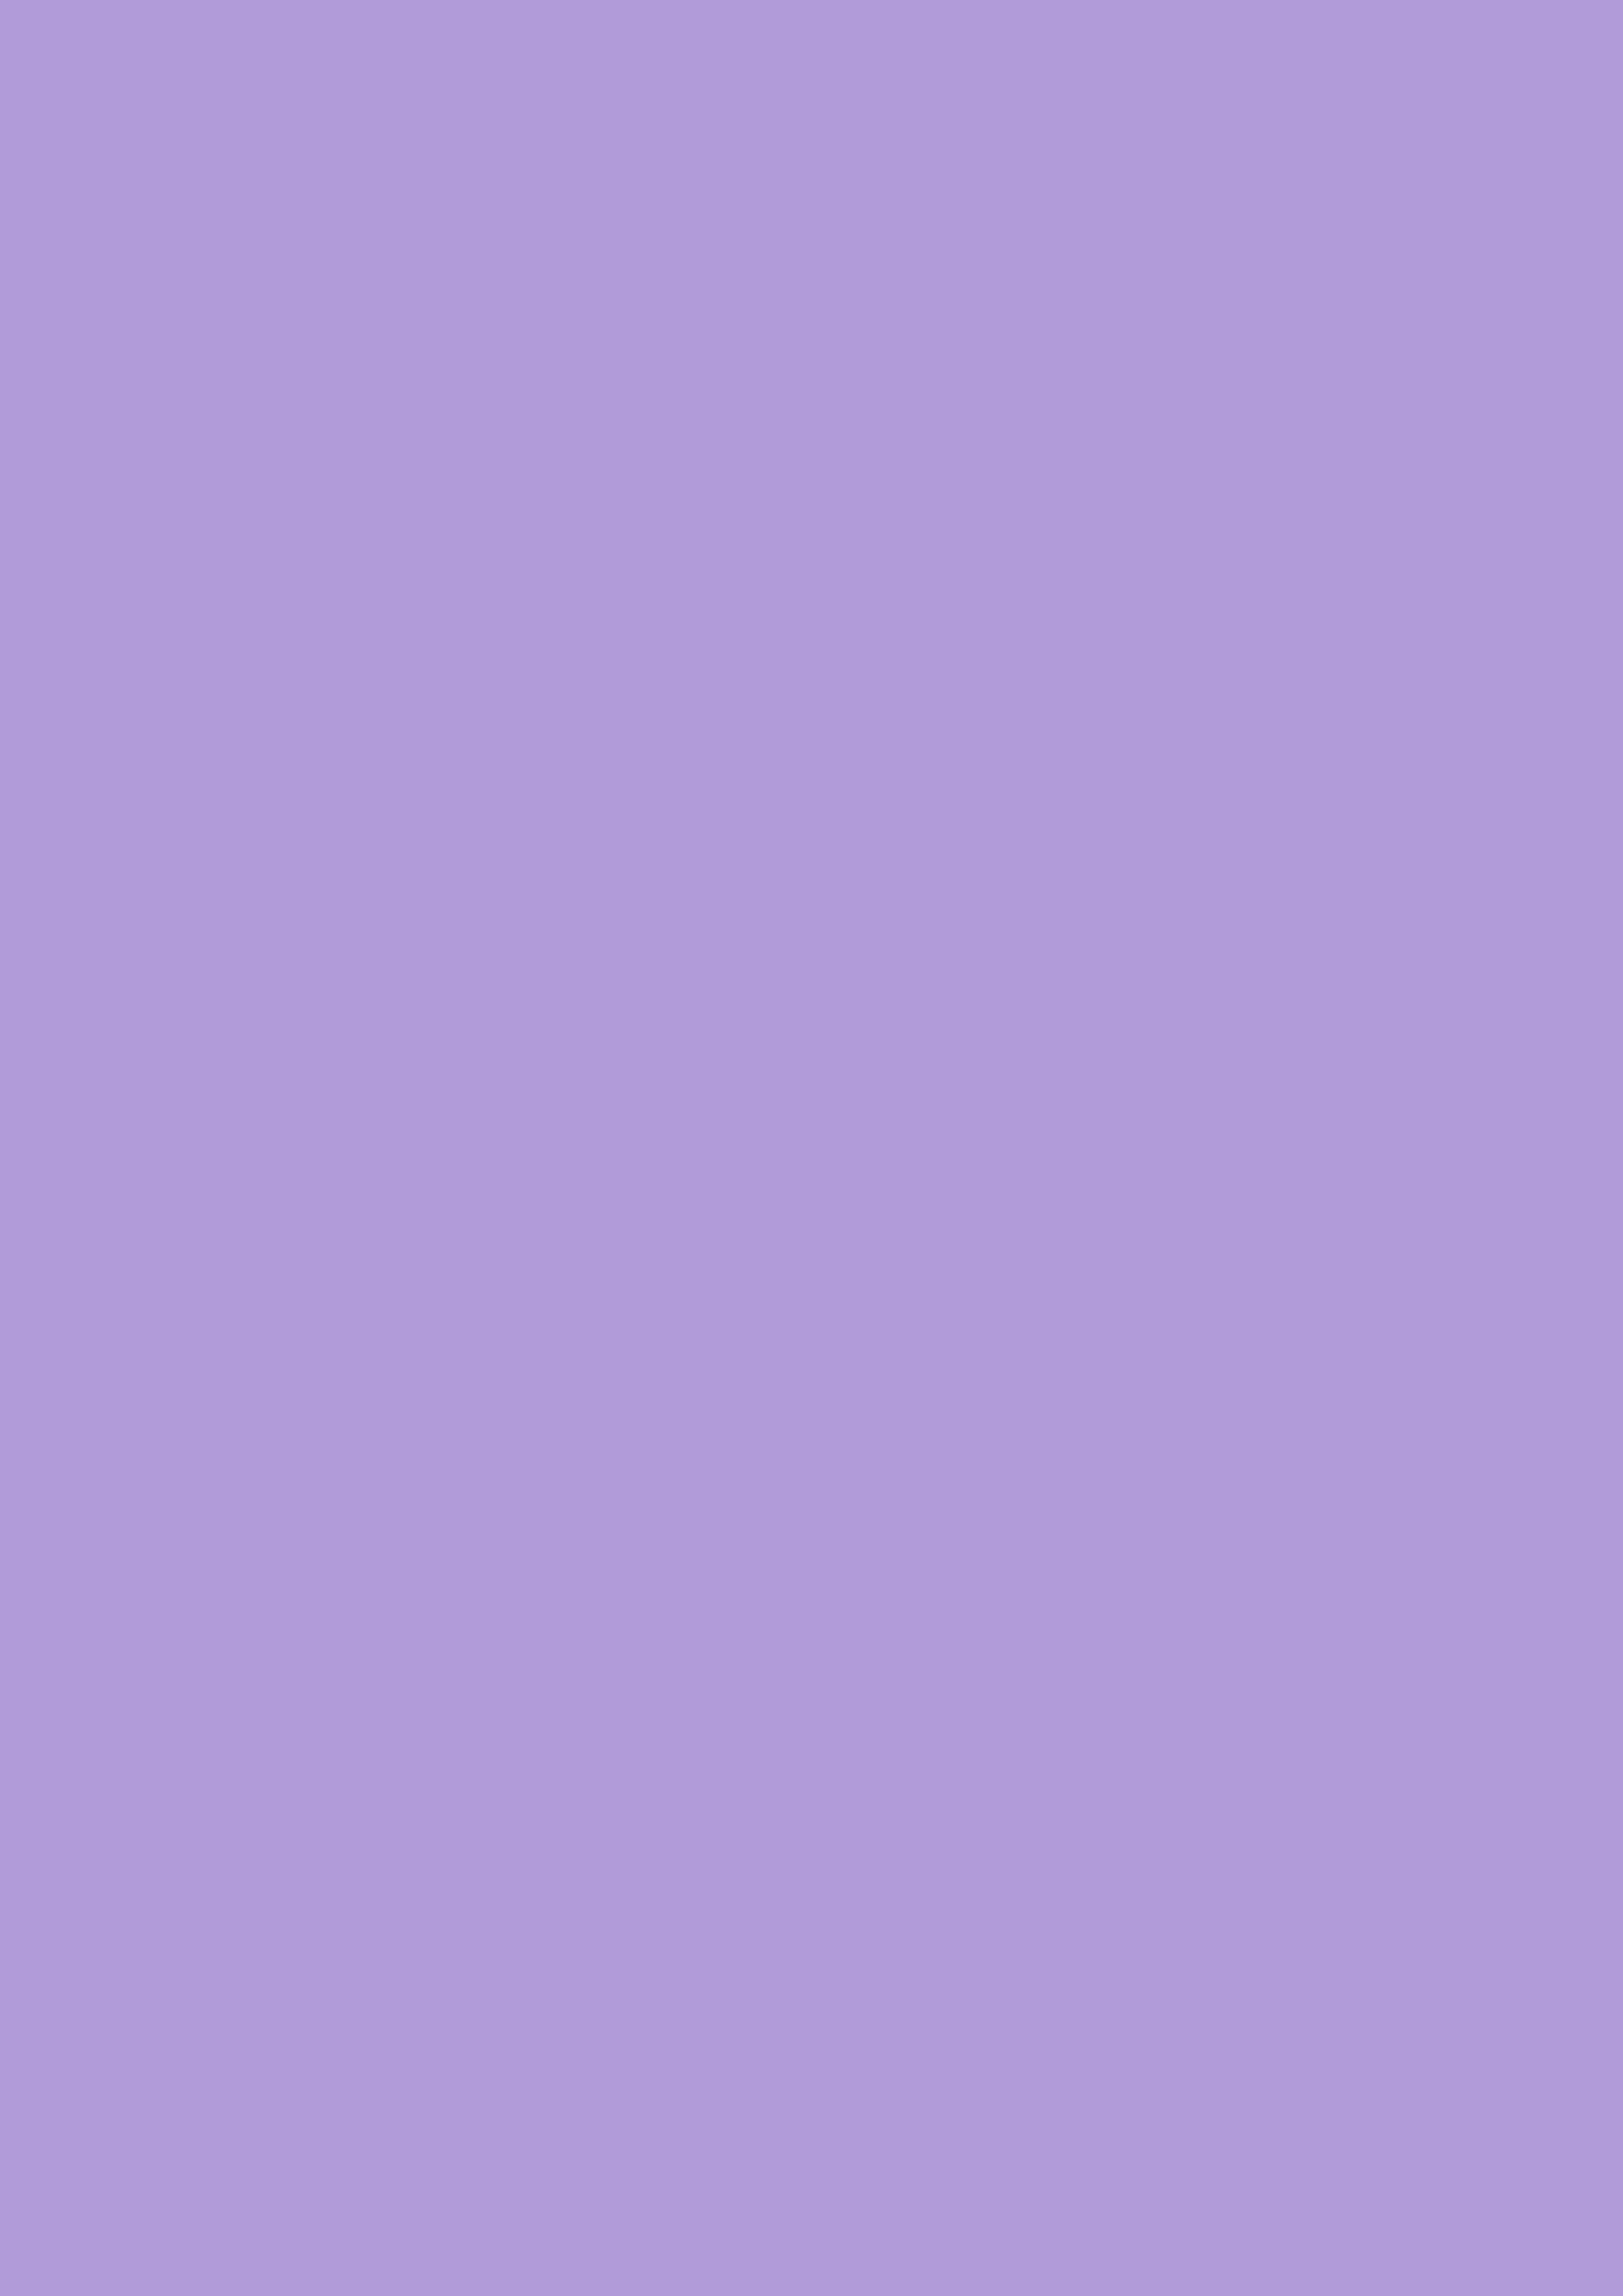 2480x3508 light pastel purple solid color background